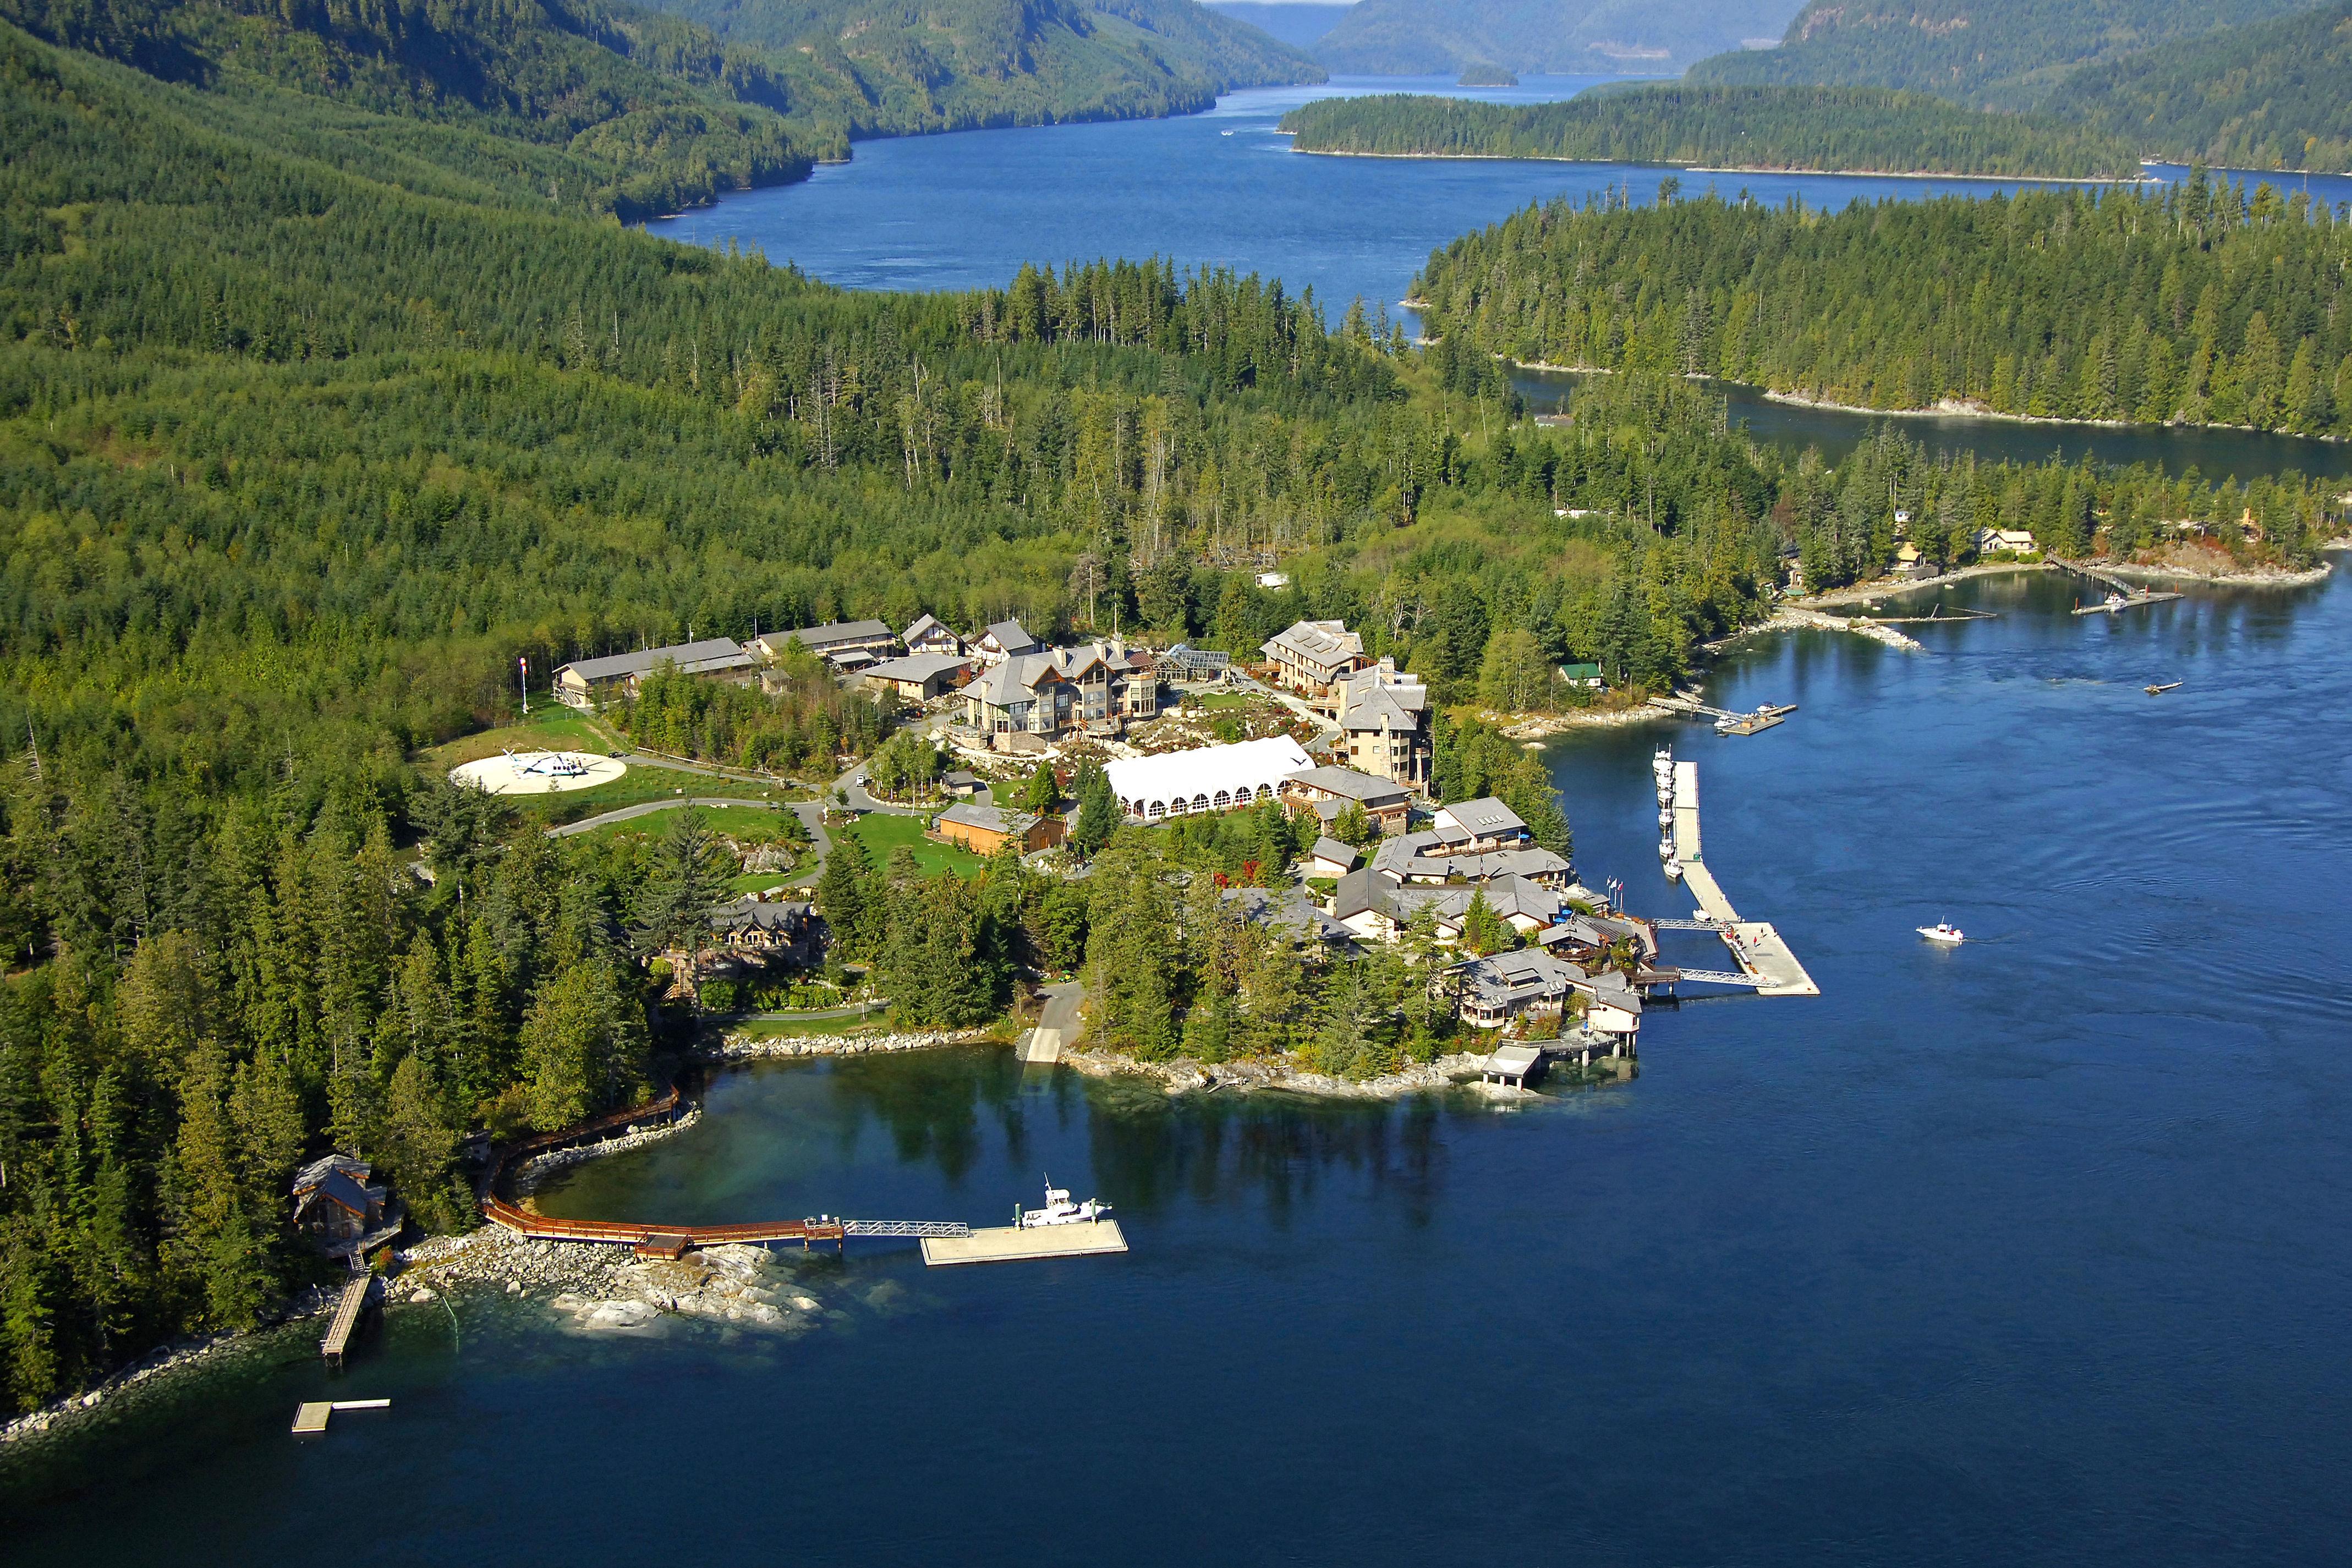 Sonora Resort in Sonora Island, BC, Canada - Marina Reviews - Phone